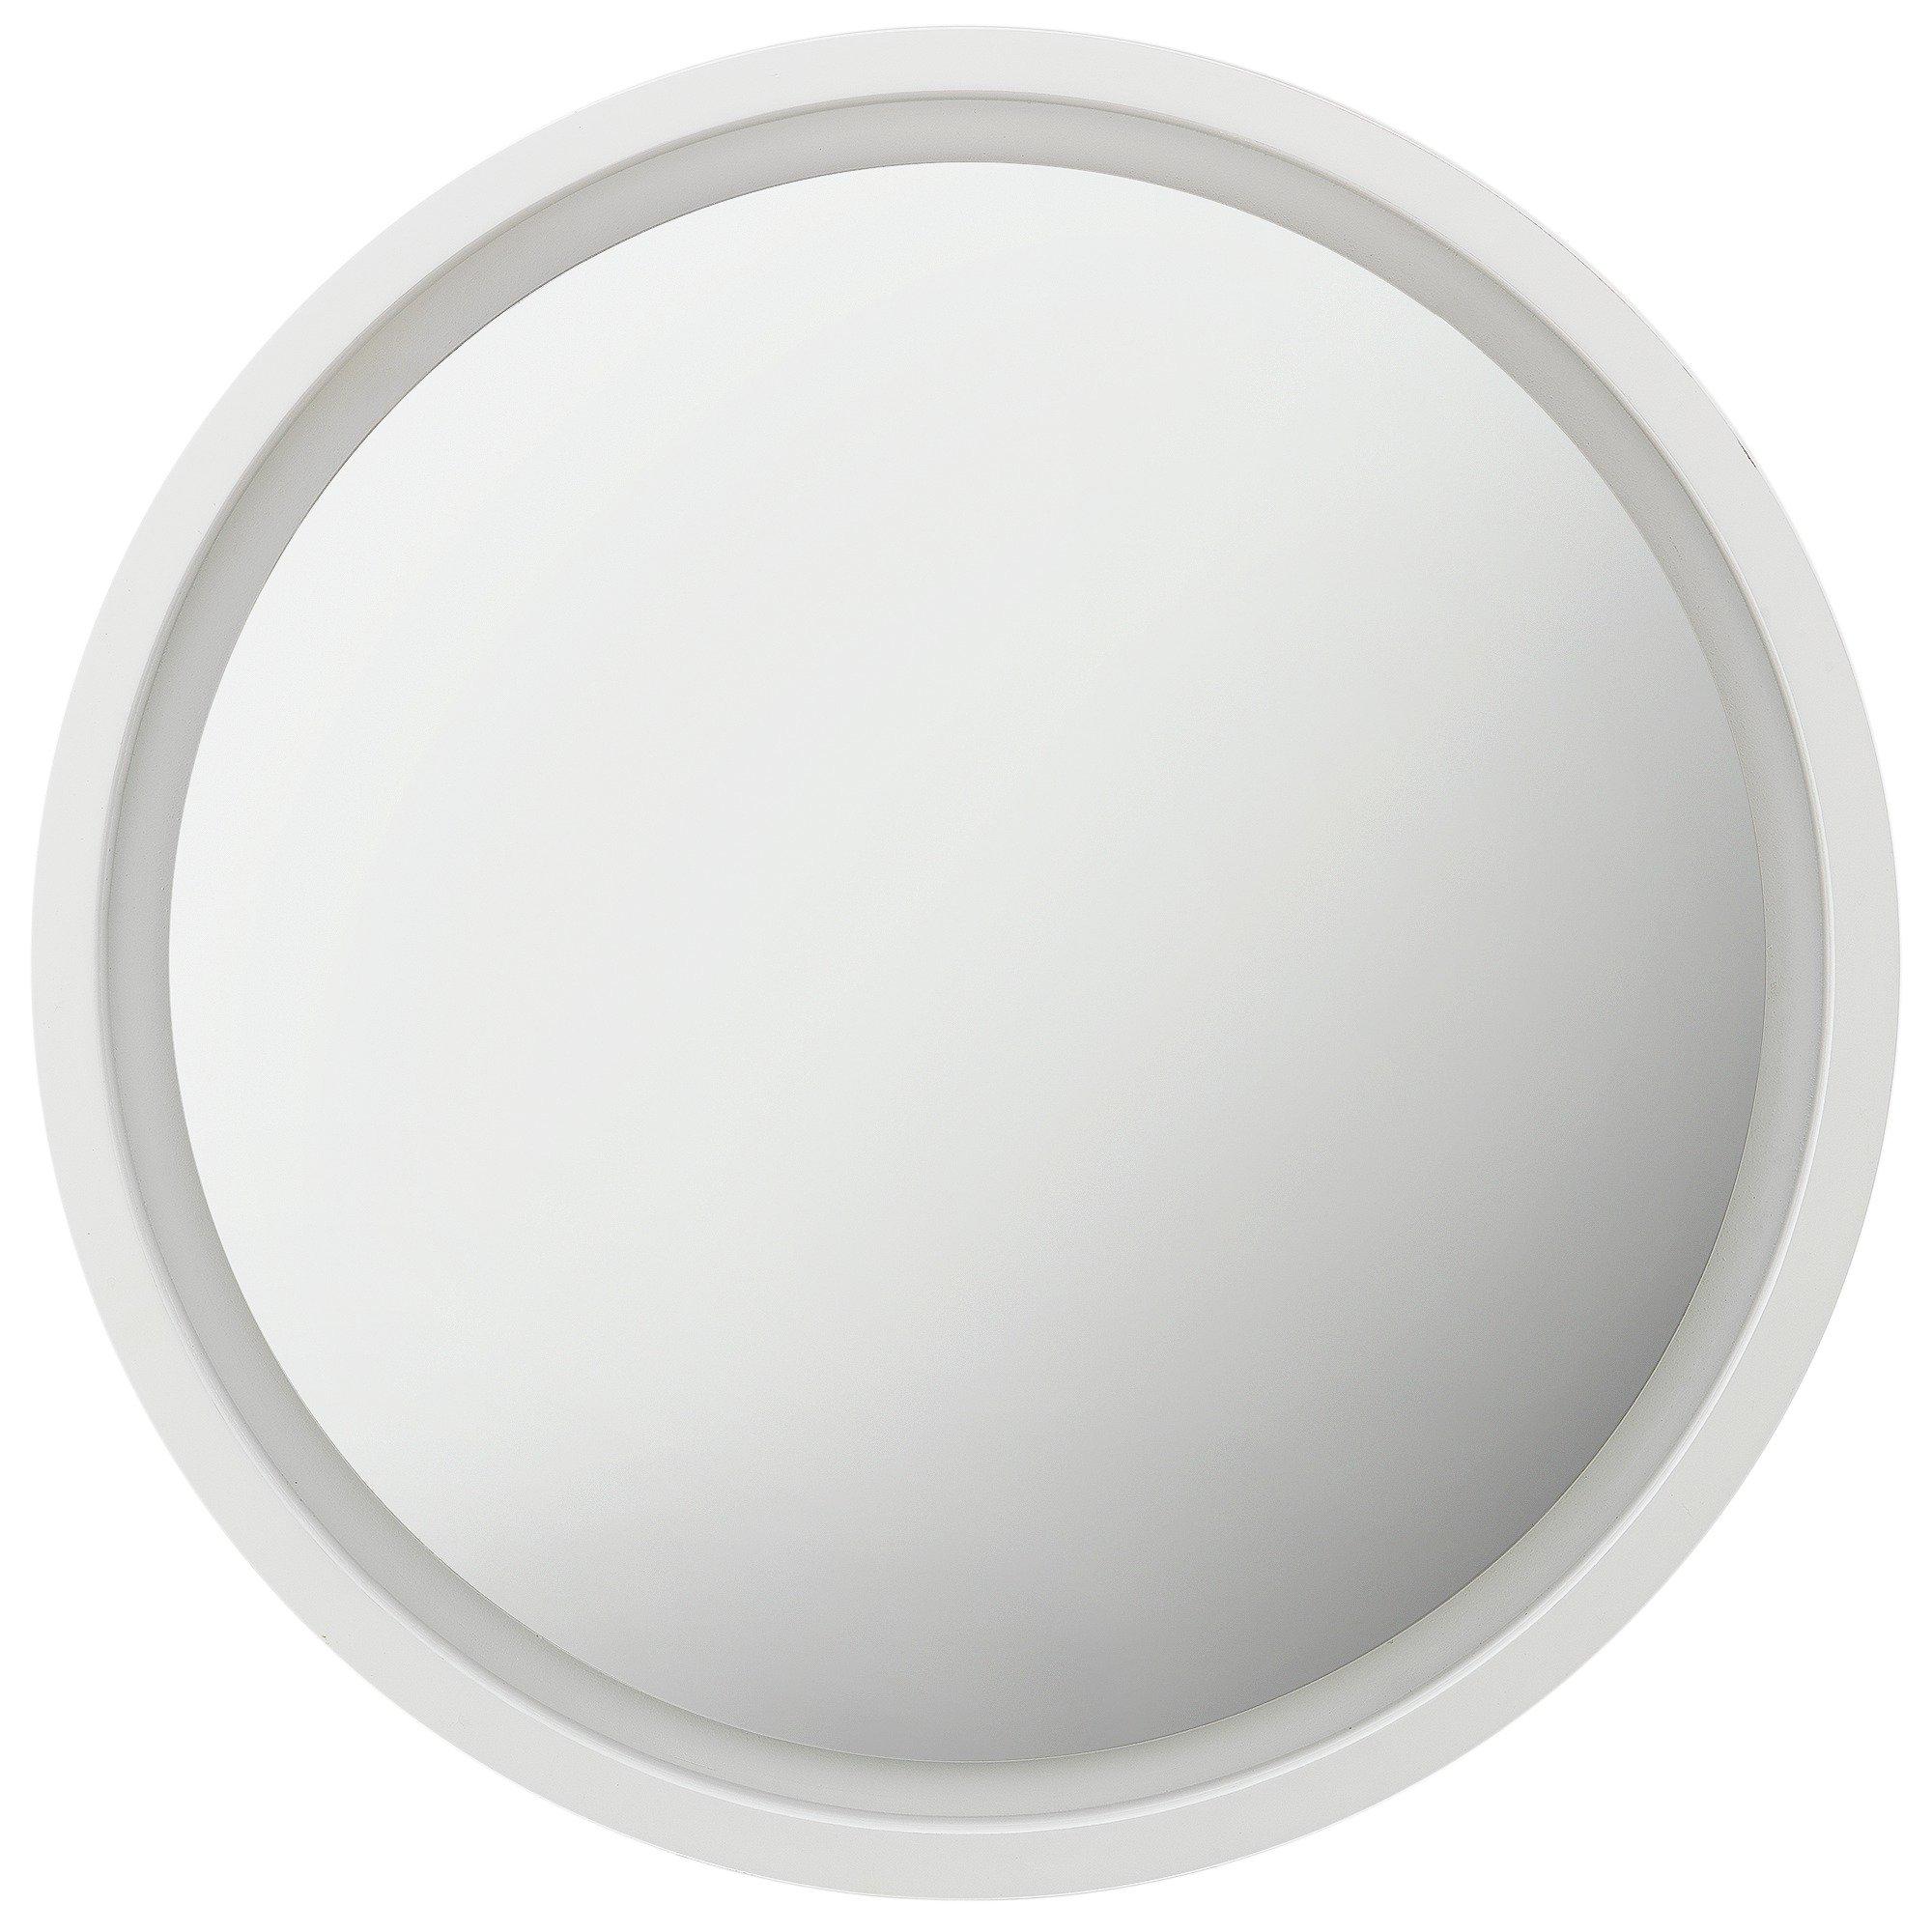 Argos Home Siena Round Floating Wooden Mirror - White